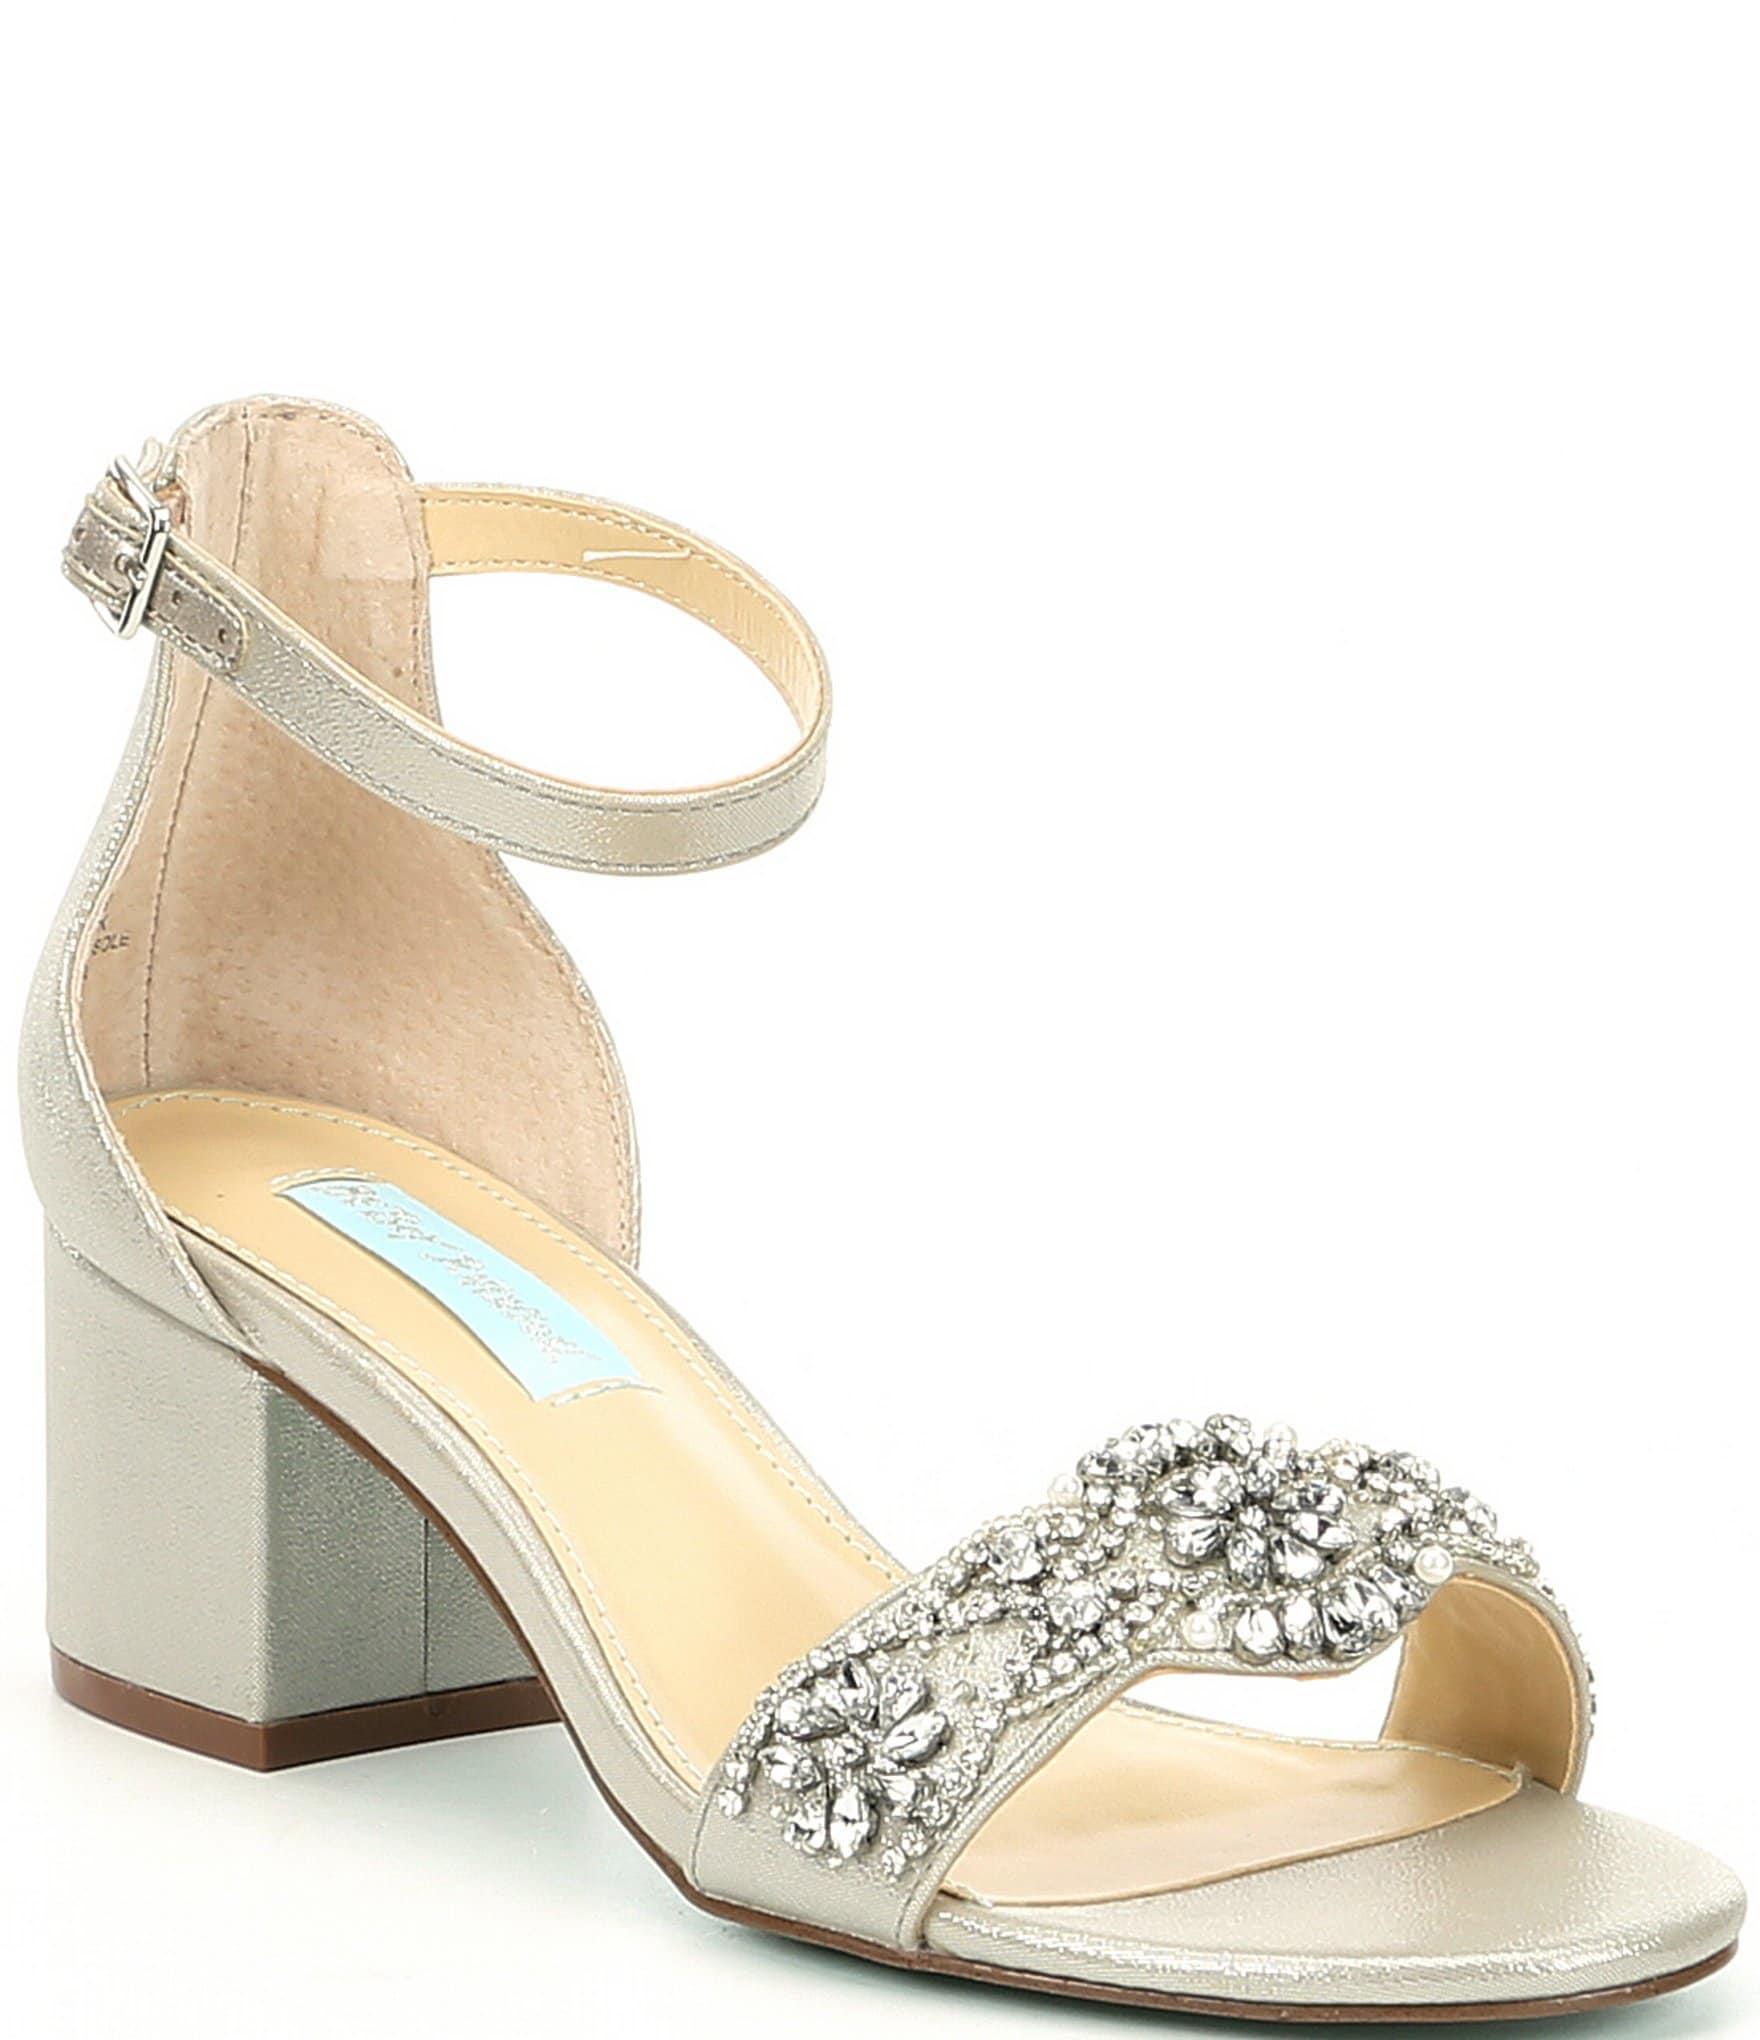 Silver Block Heel Wedding Shoes Aliexpress 4d252 53046